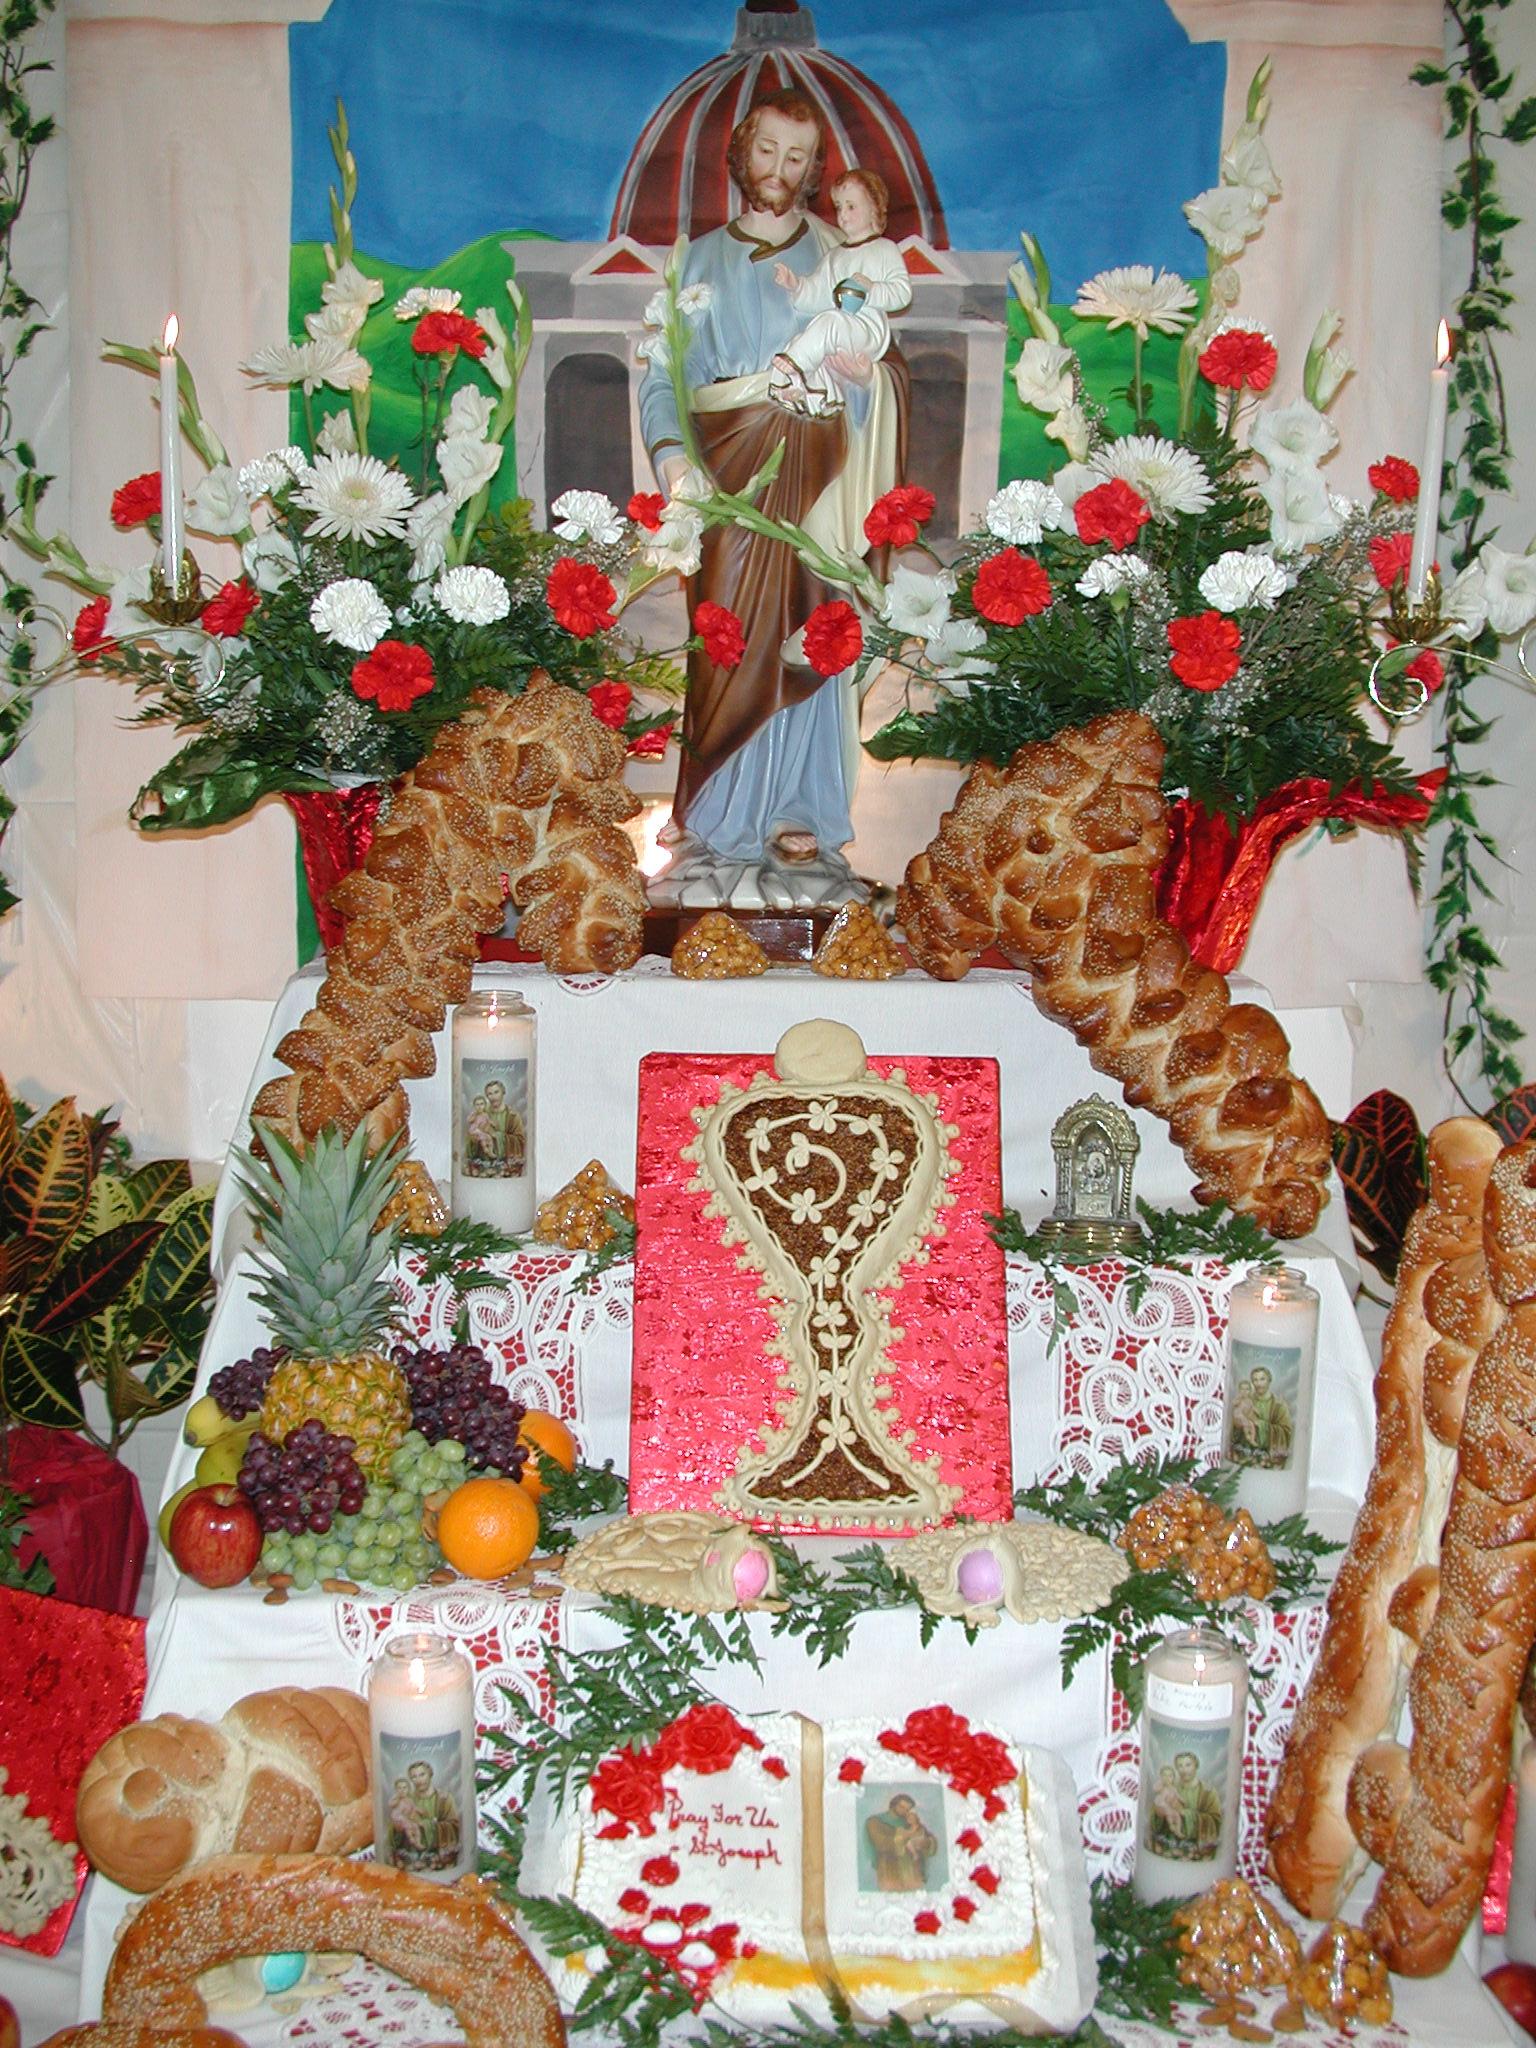 A Saint Joseph's Day altar in New Orleans, LA